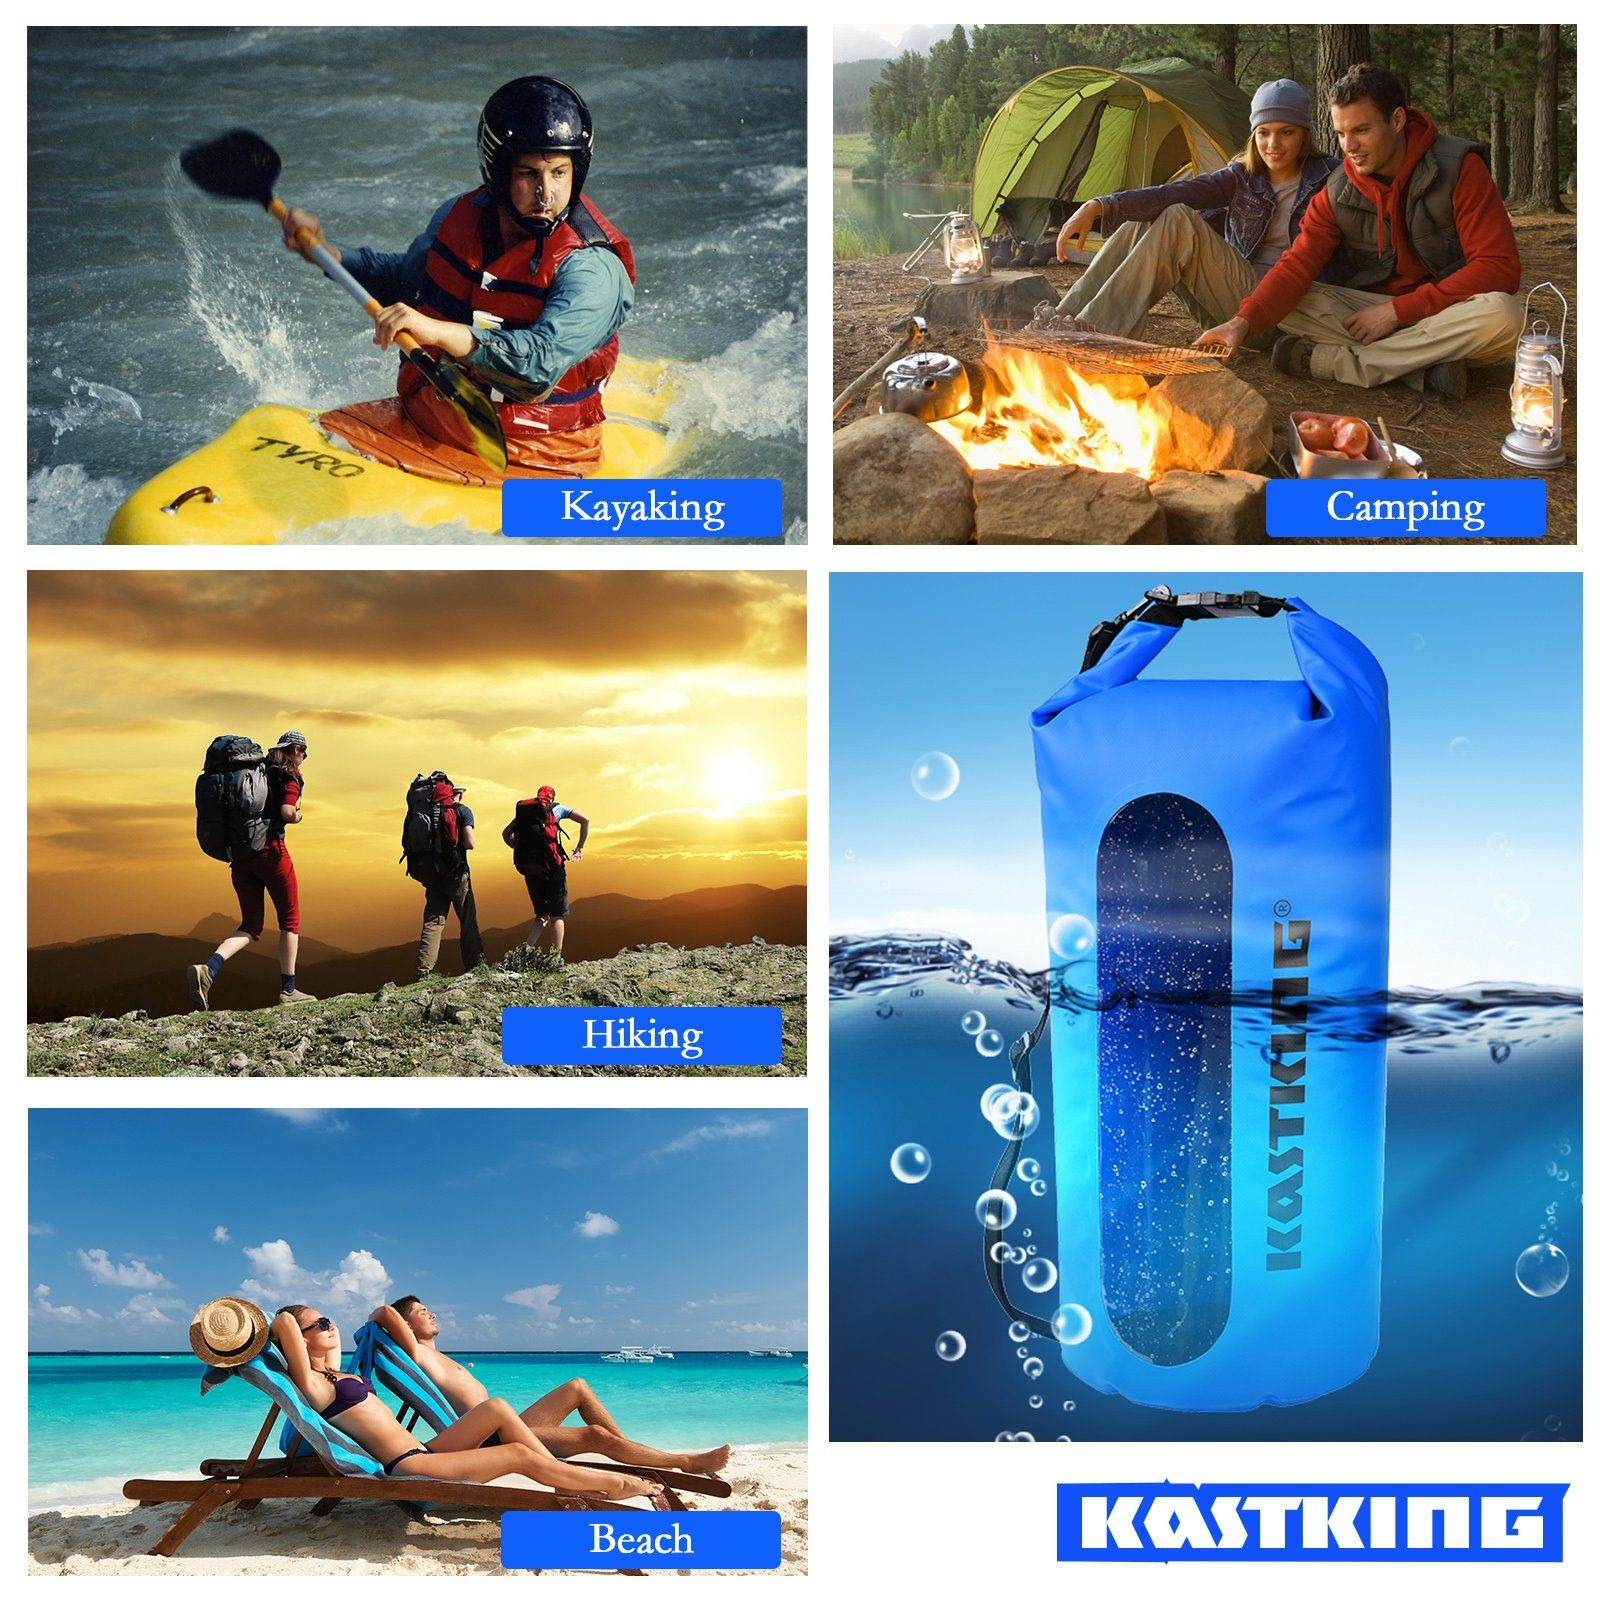 8L Canoe Kayaking Fishing Camping Waterproof Dry Bags Swimming Hiking Sack Bags